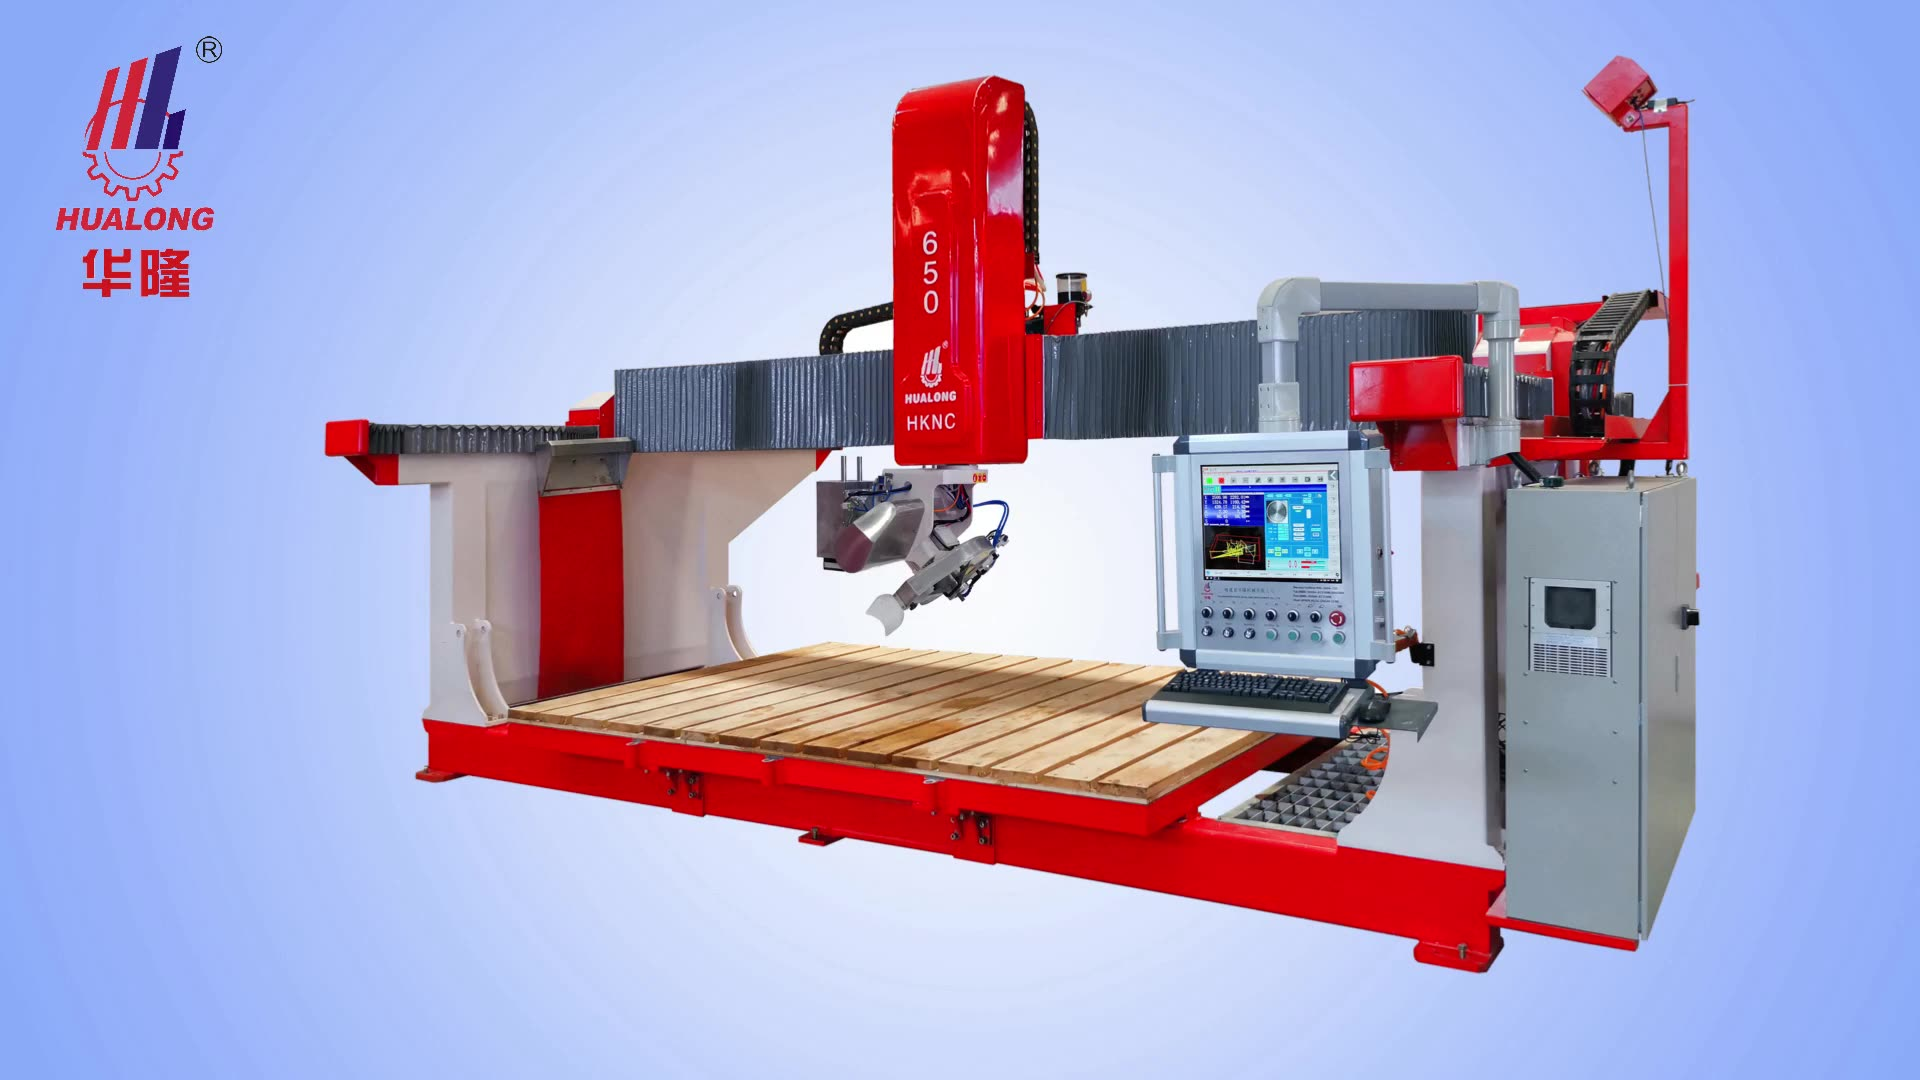 HUALONG machinery HKNC-650X multipurpose bridge saw CNC Stone  Cutting Machine 5 axis for granite marble slab countertop